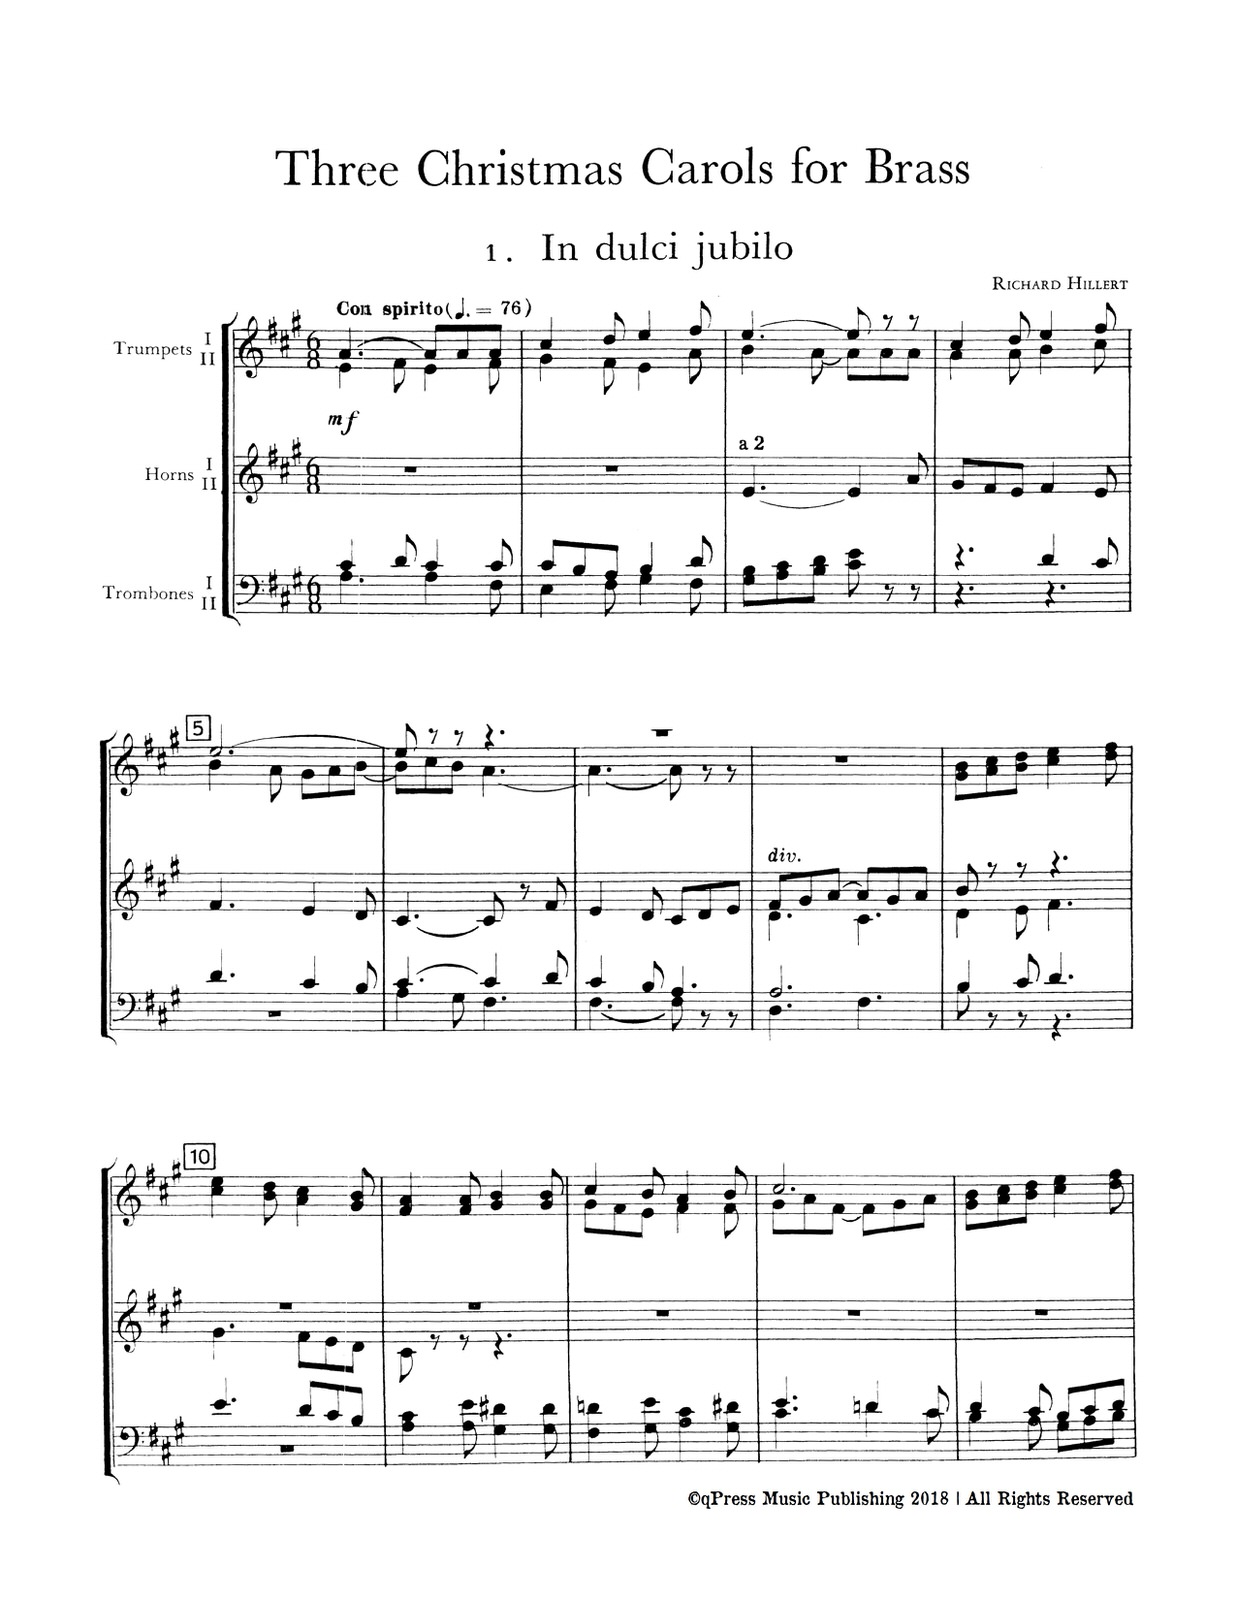 Christmas Carol Music.3 Christmas Carols For Brass By Hillert Richard Qpress